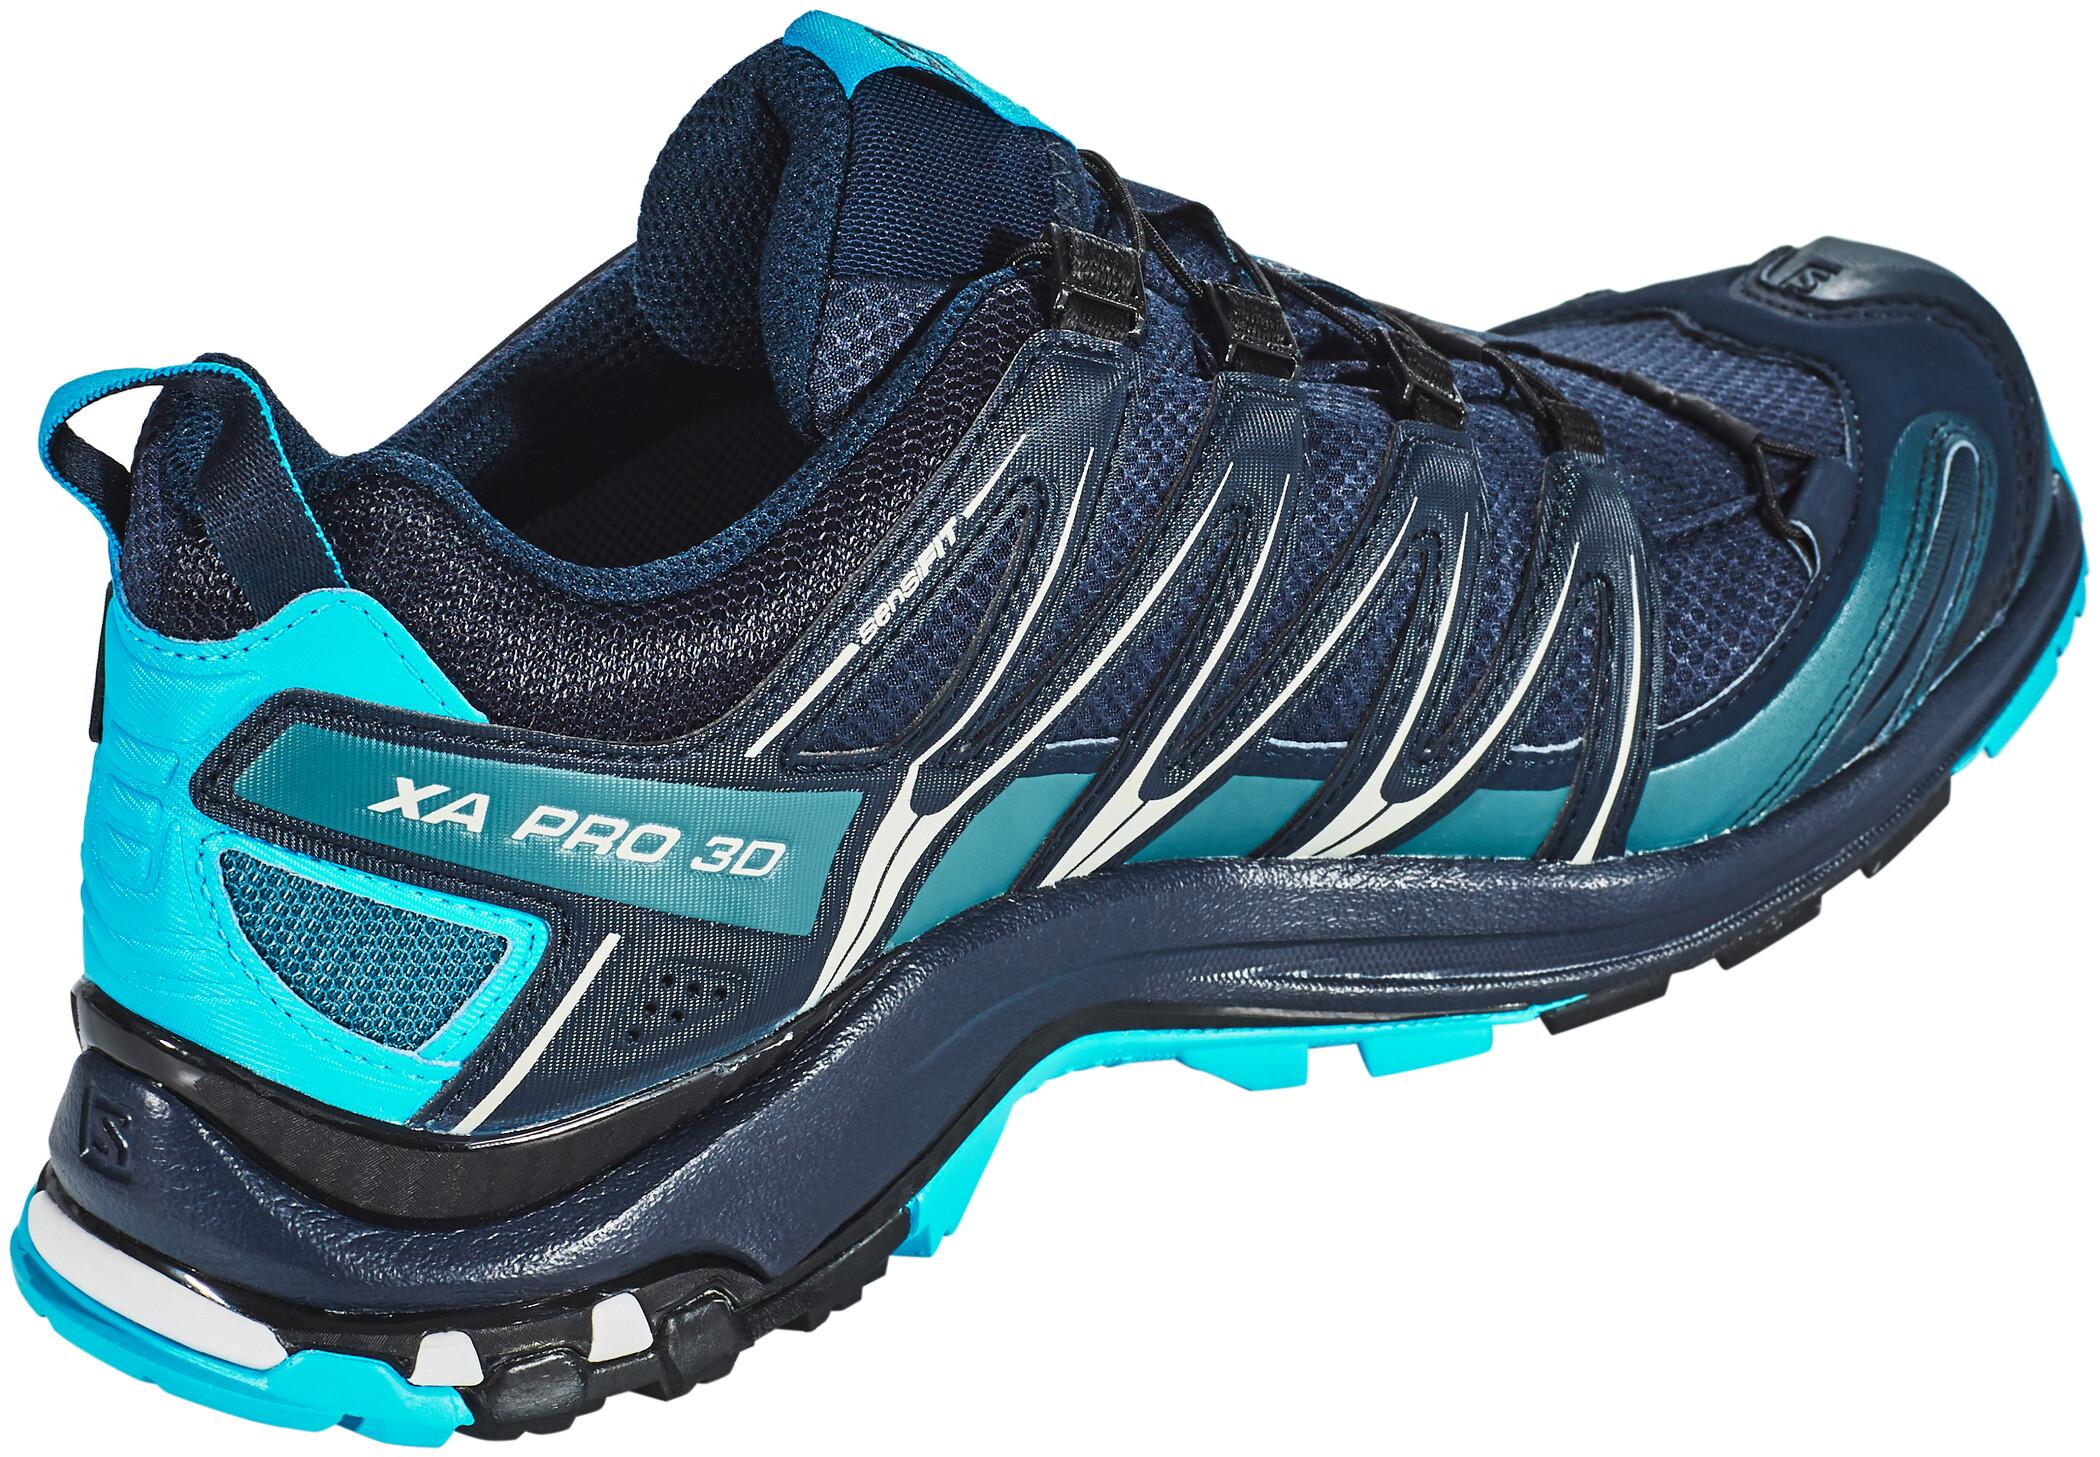 Salomon XA Pro 3D GTX Trailrunning Schuhe Herren navy blazerhawaiian oceandawn blue